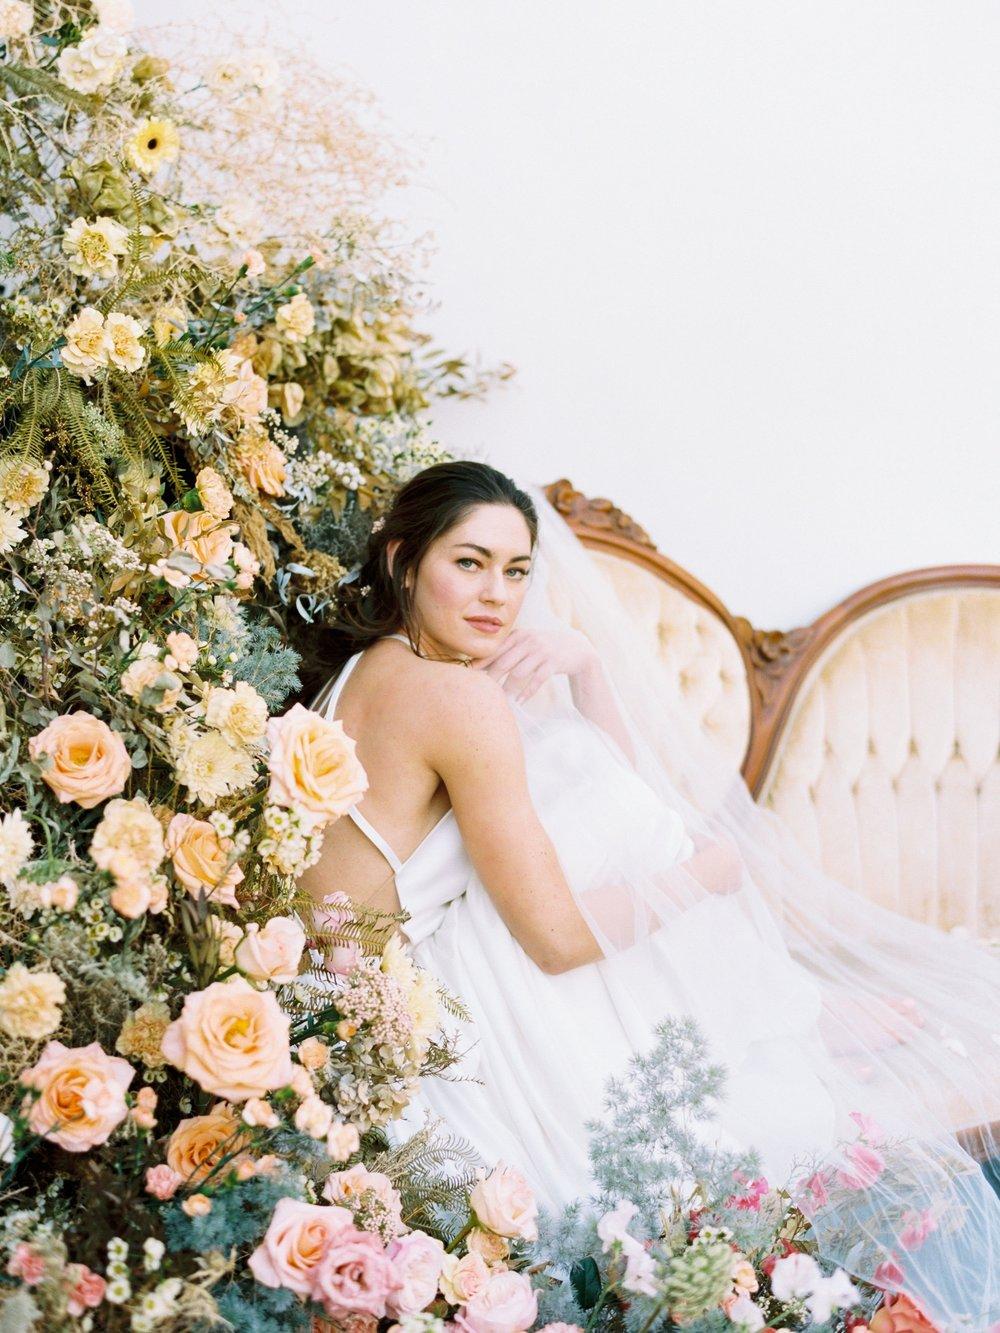 NECTAR + BLOOM floral installation | KIM BRANNAGAN Photography